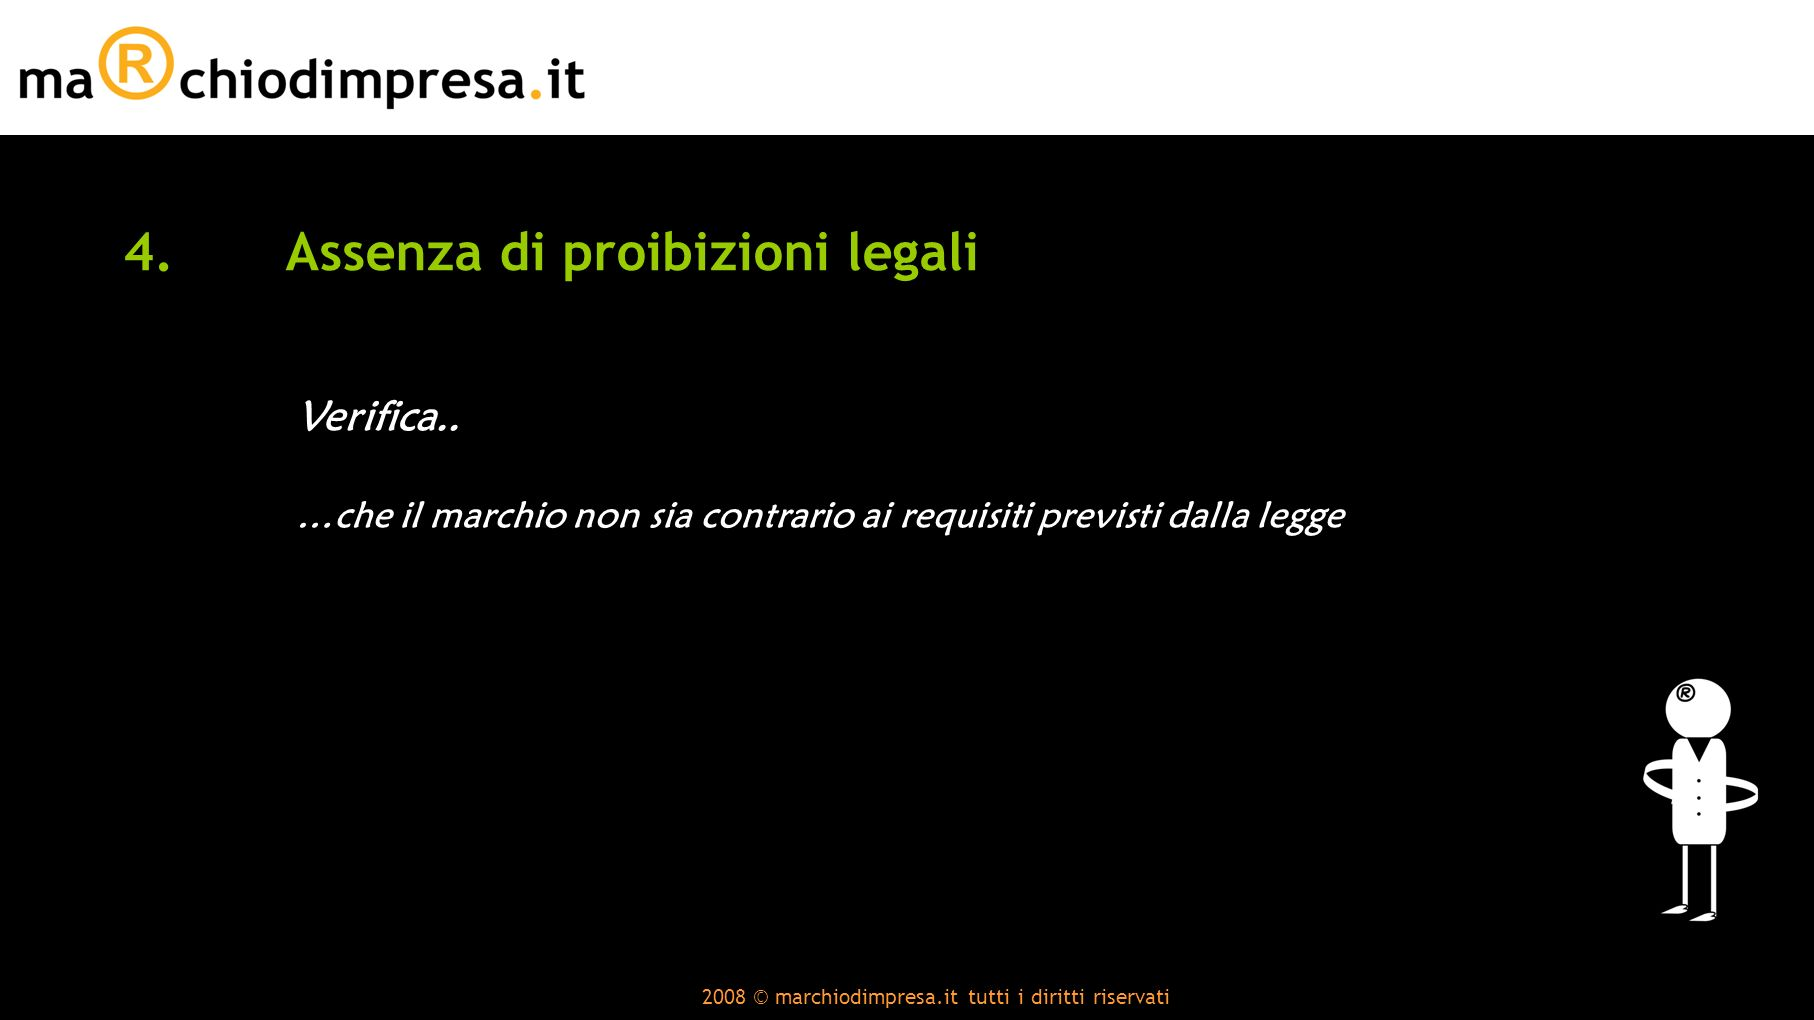 2008 © marchiodimpresa.it tutti i diritti riservati 4.Assenza di proibizioni legali Verifica..